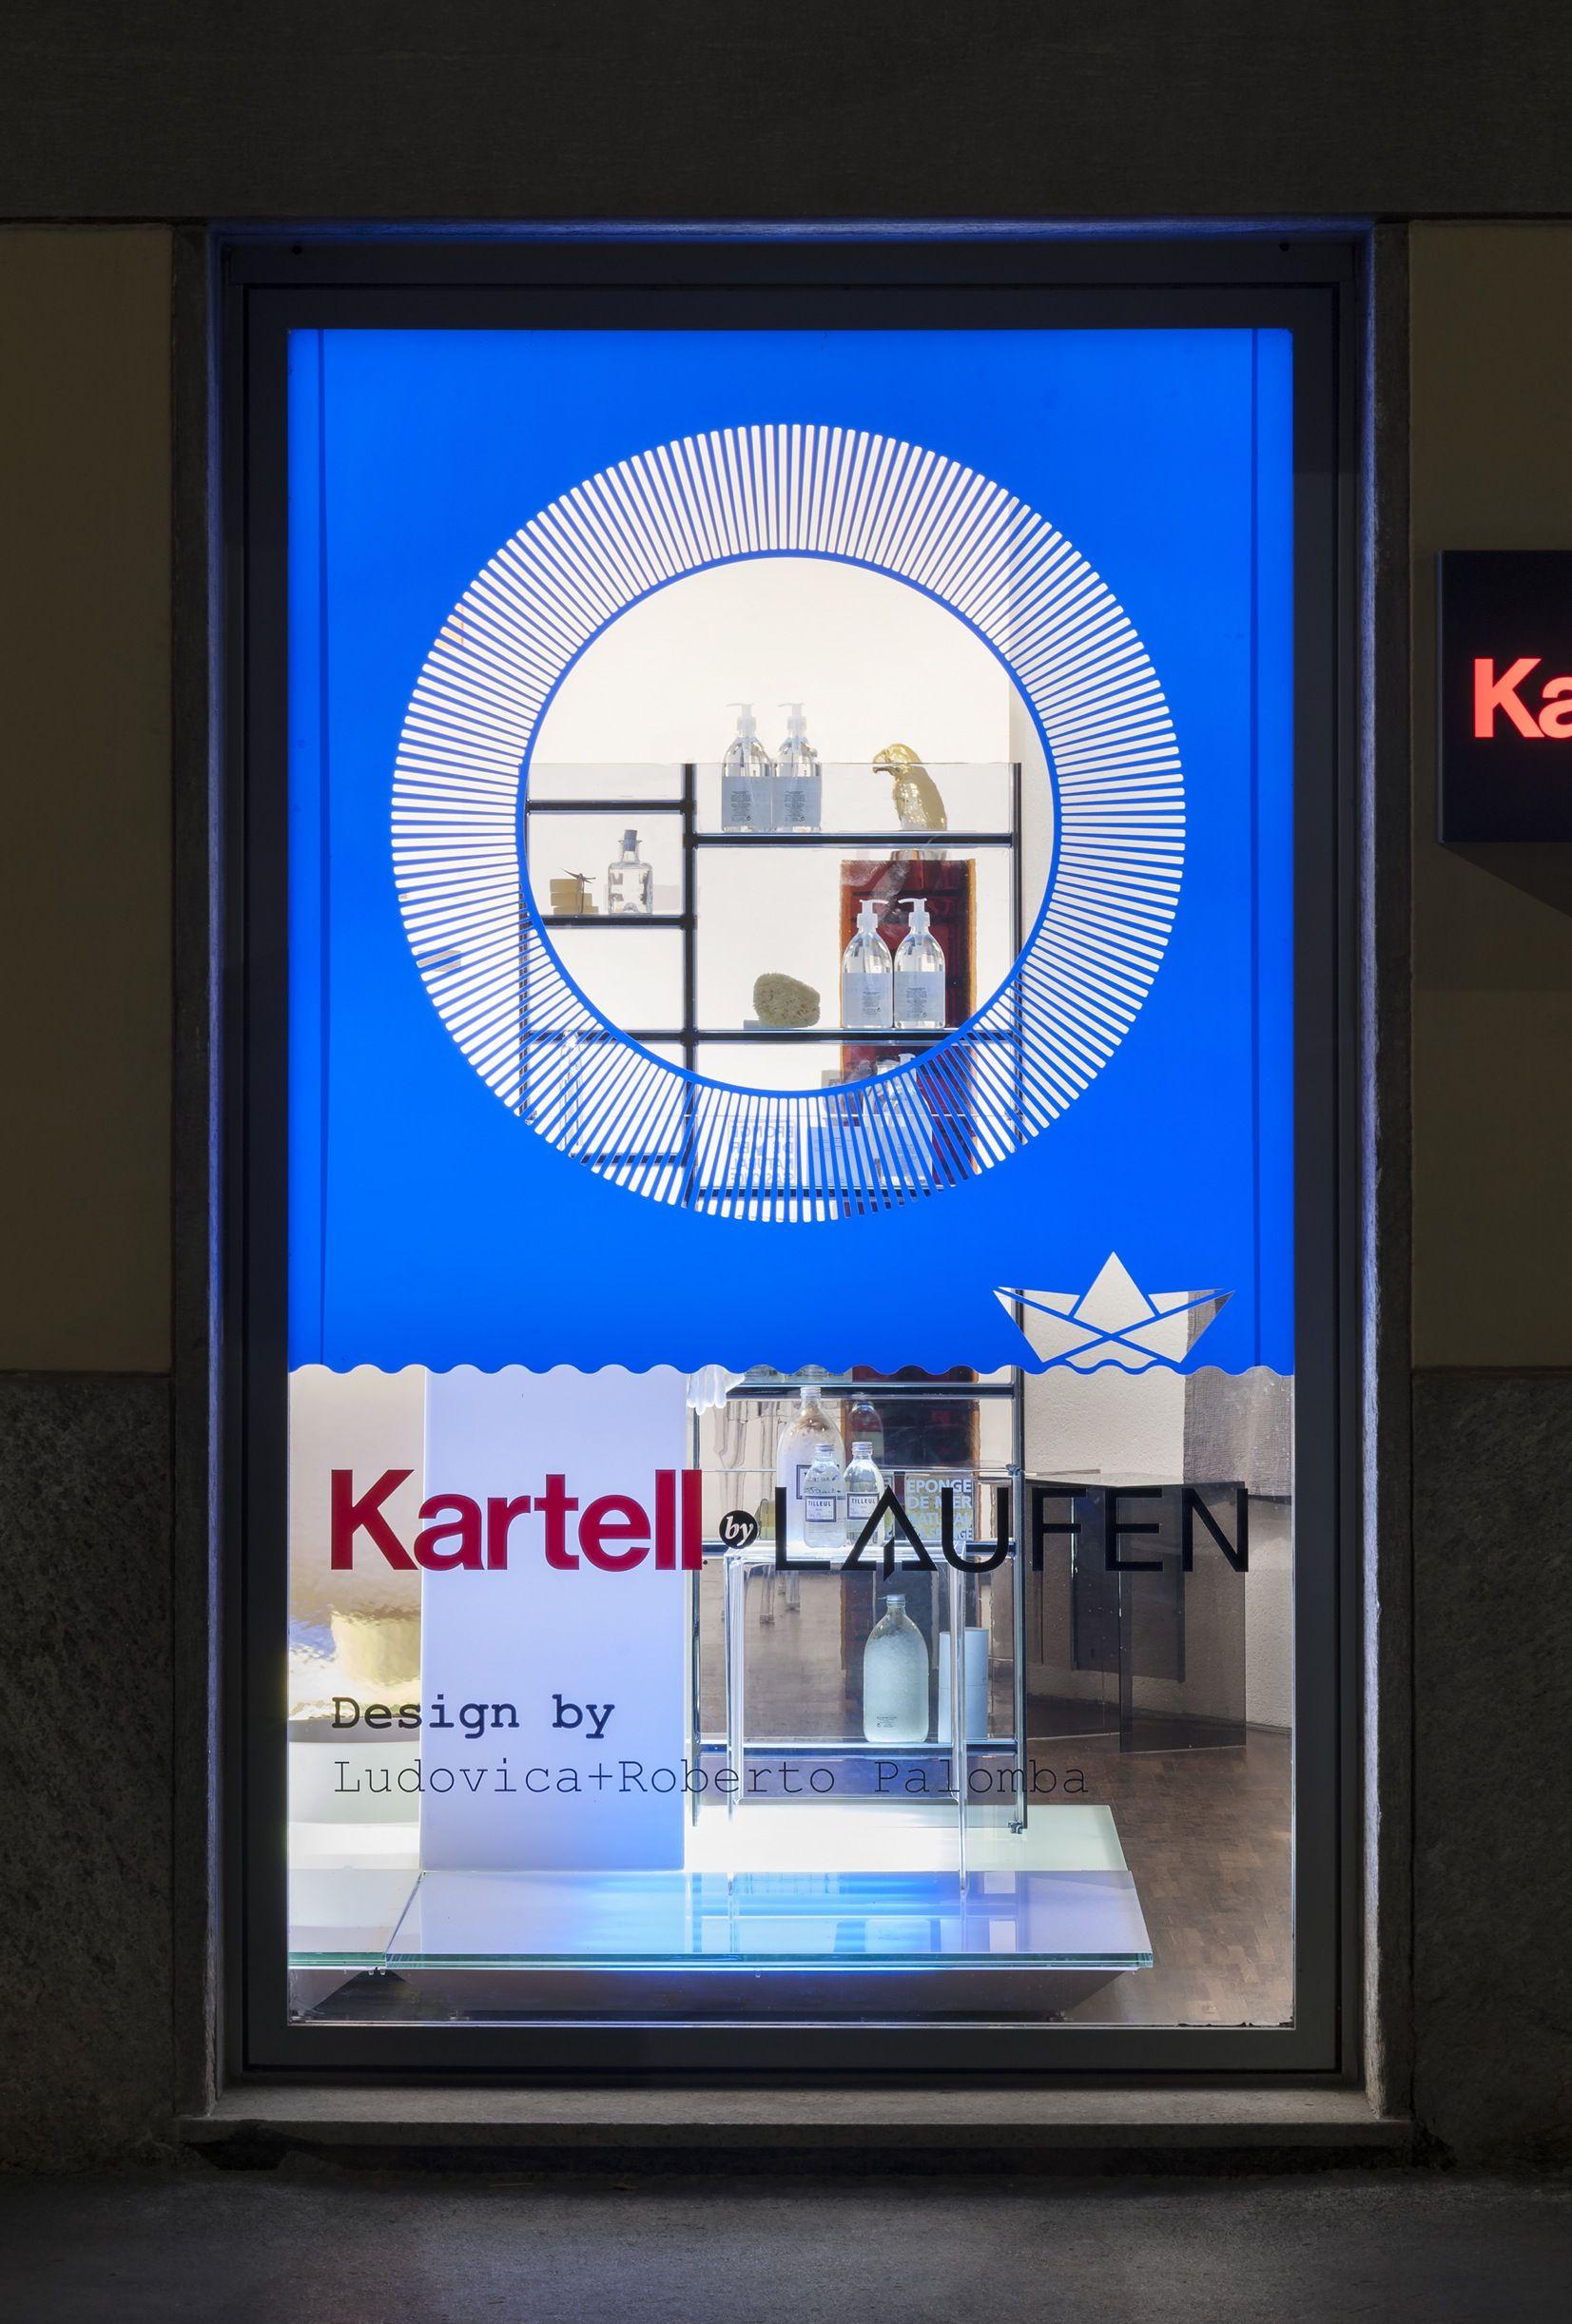 Kartell By Laufen Flaship Store Milano Kartellbylaufen Credit Simona Pesarini Phot Acrylic Furniture Window Benches Display